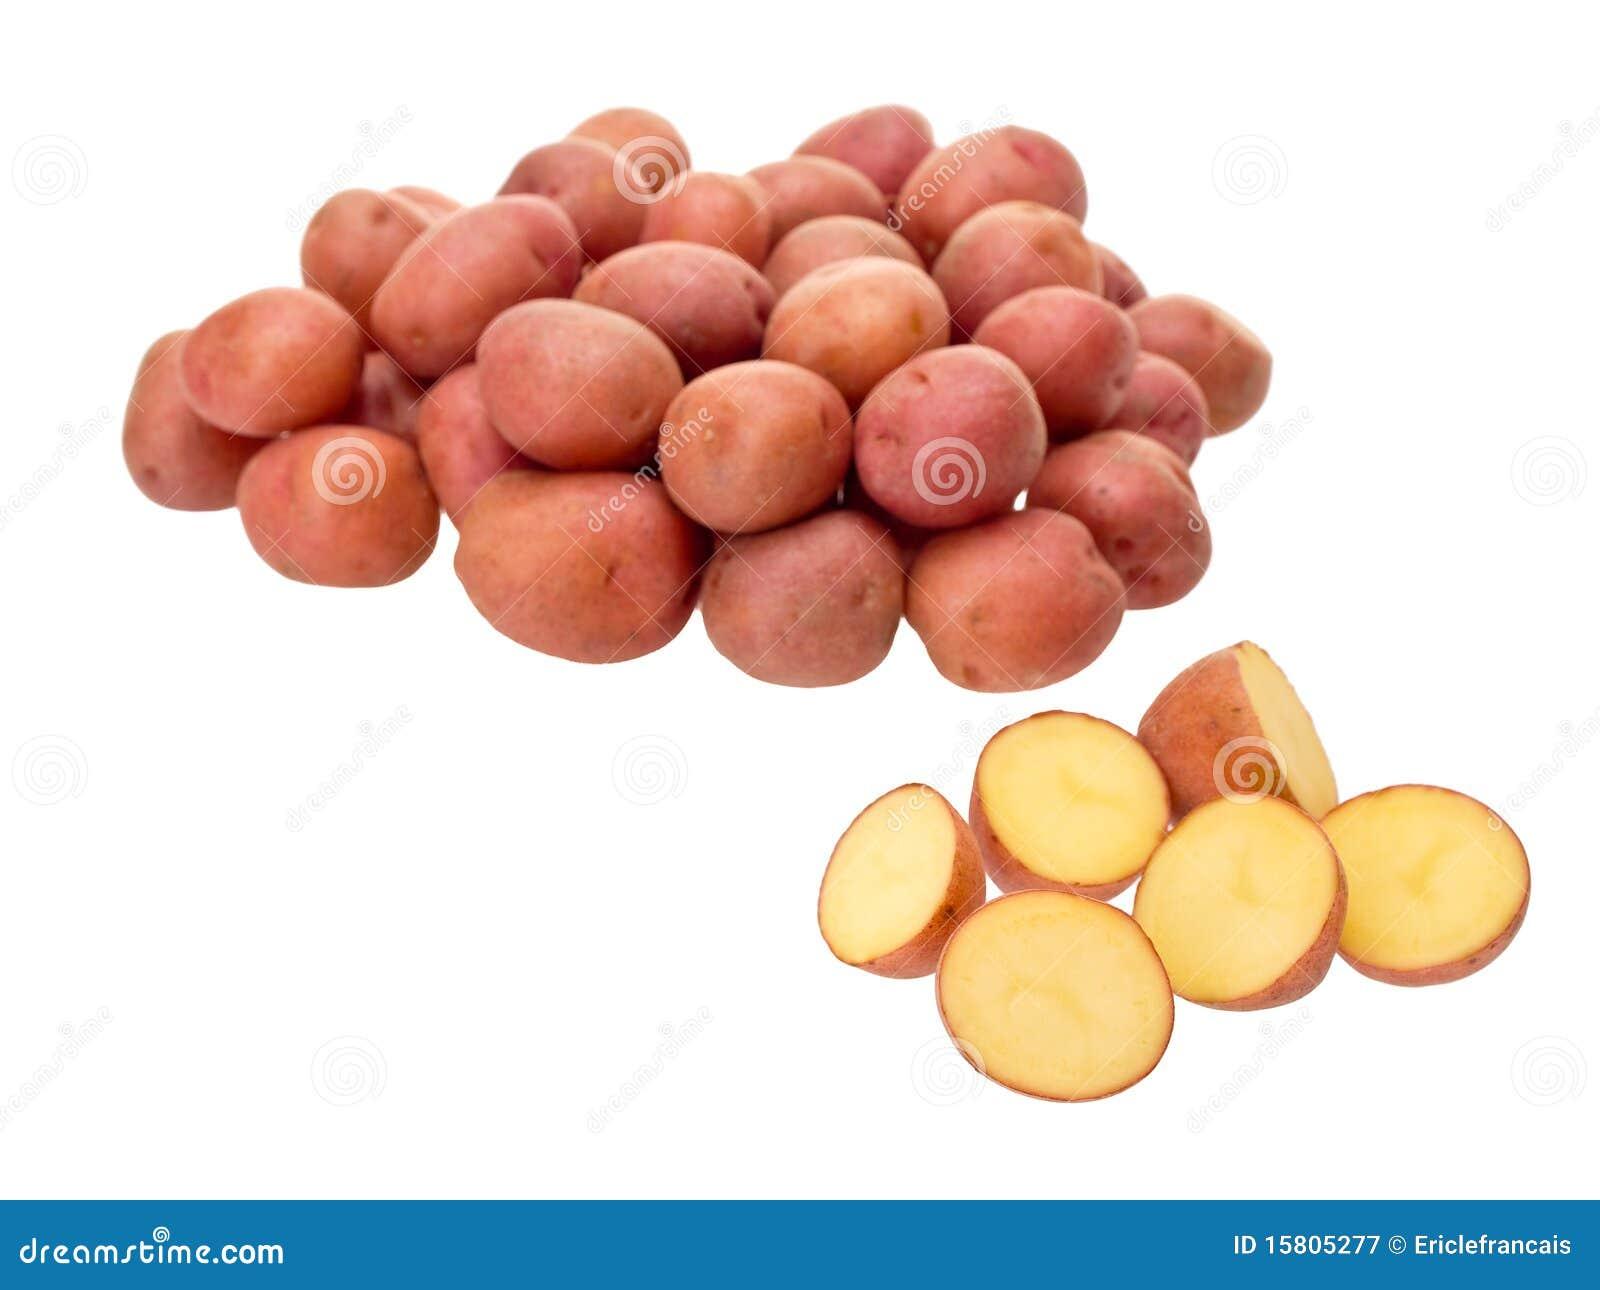 how to make potato slices